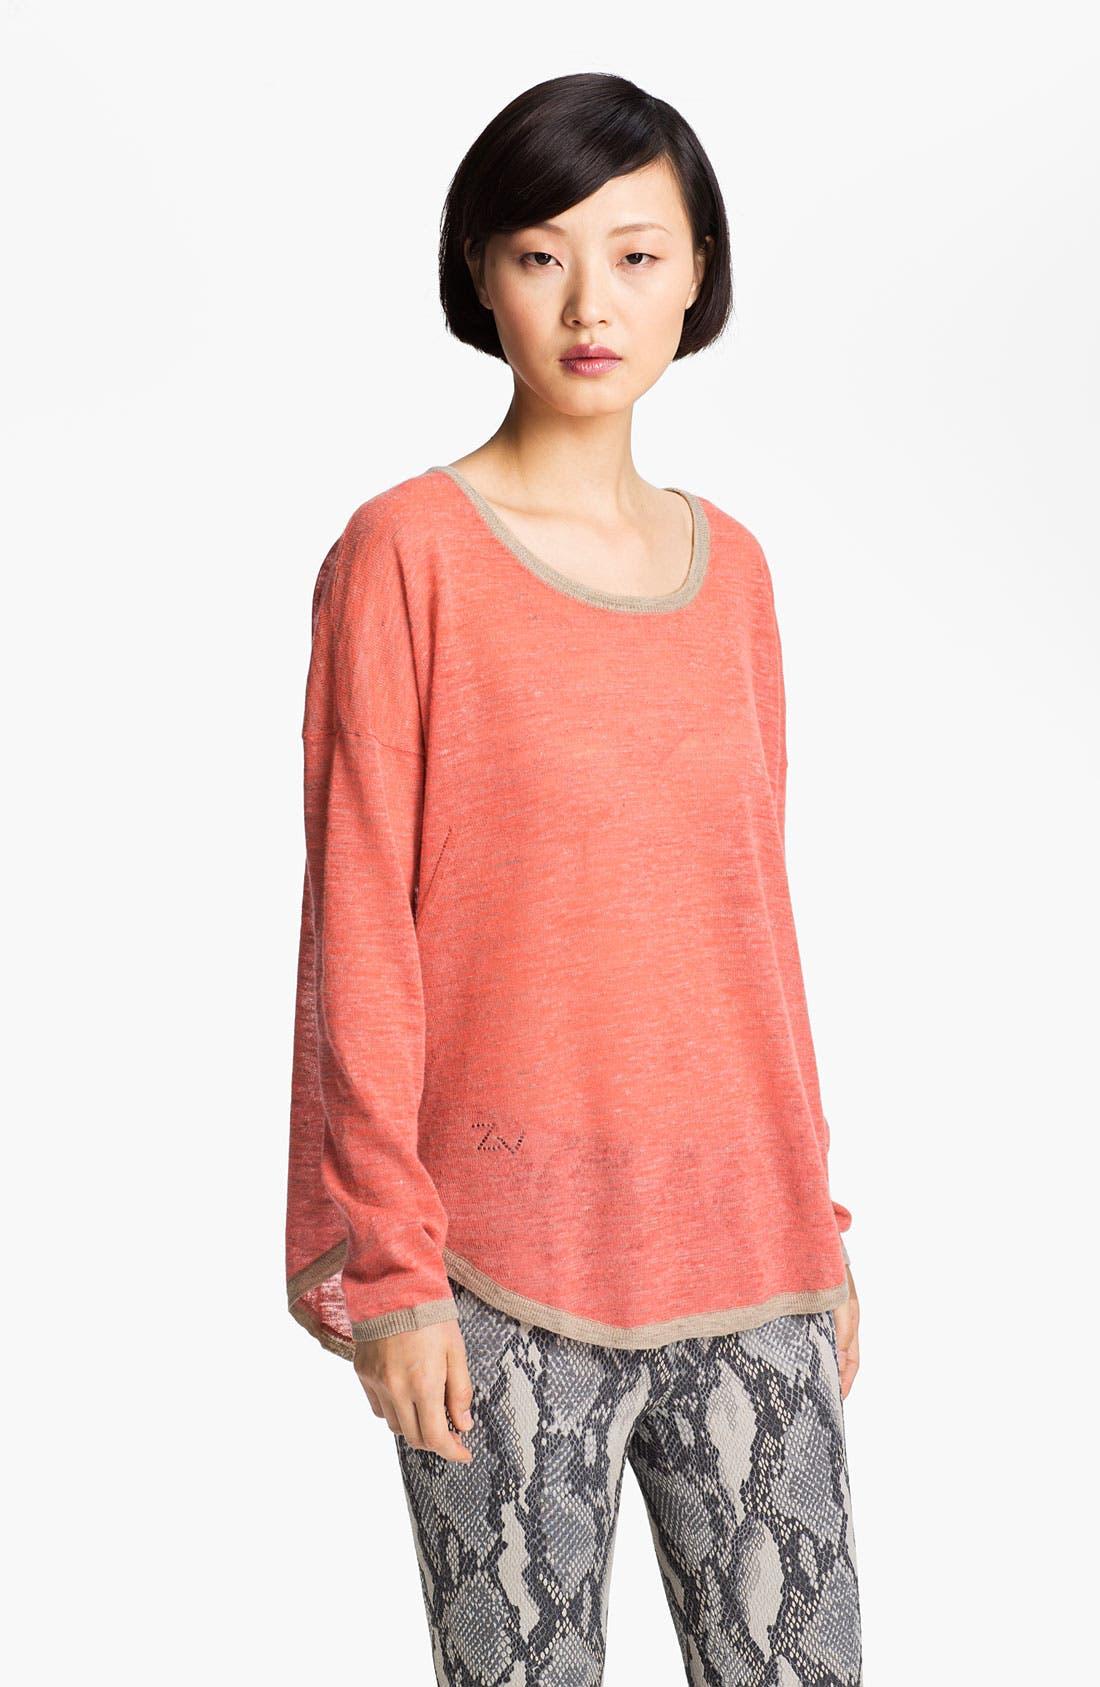 Alternate Image 1 Selected - Zadig & Voltaire 'Kimmi' Contrast Trim Sweater